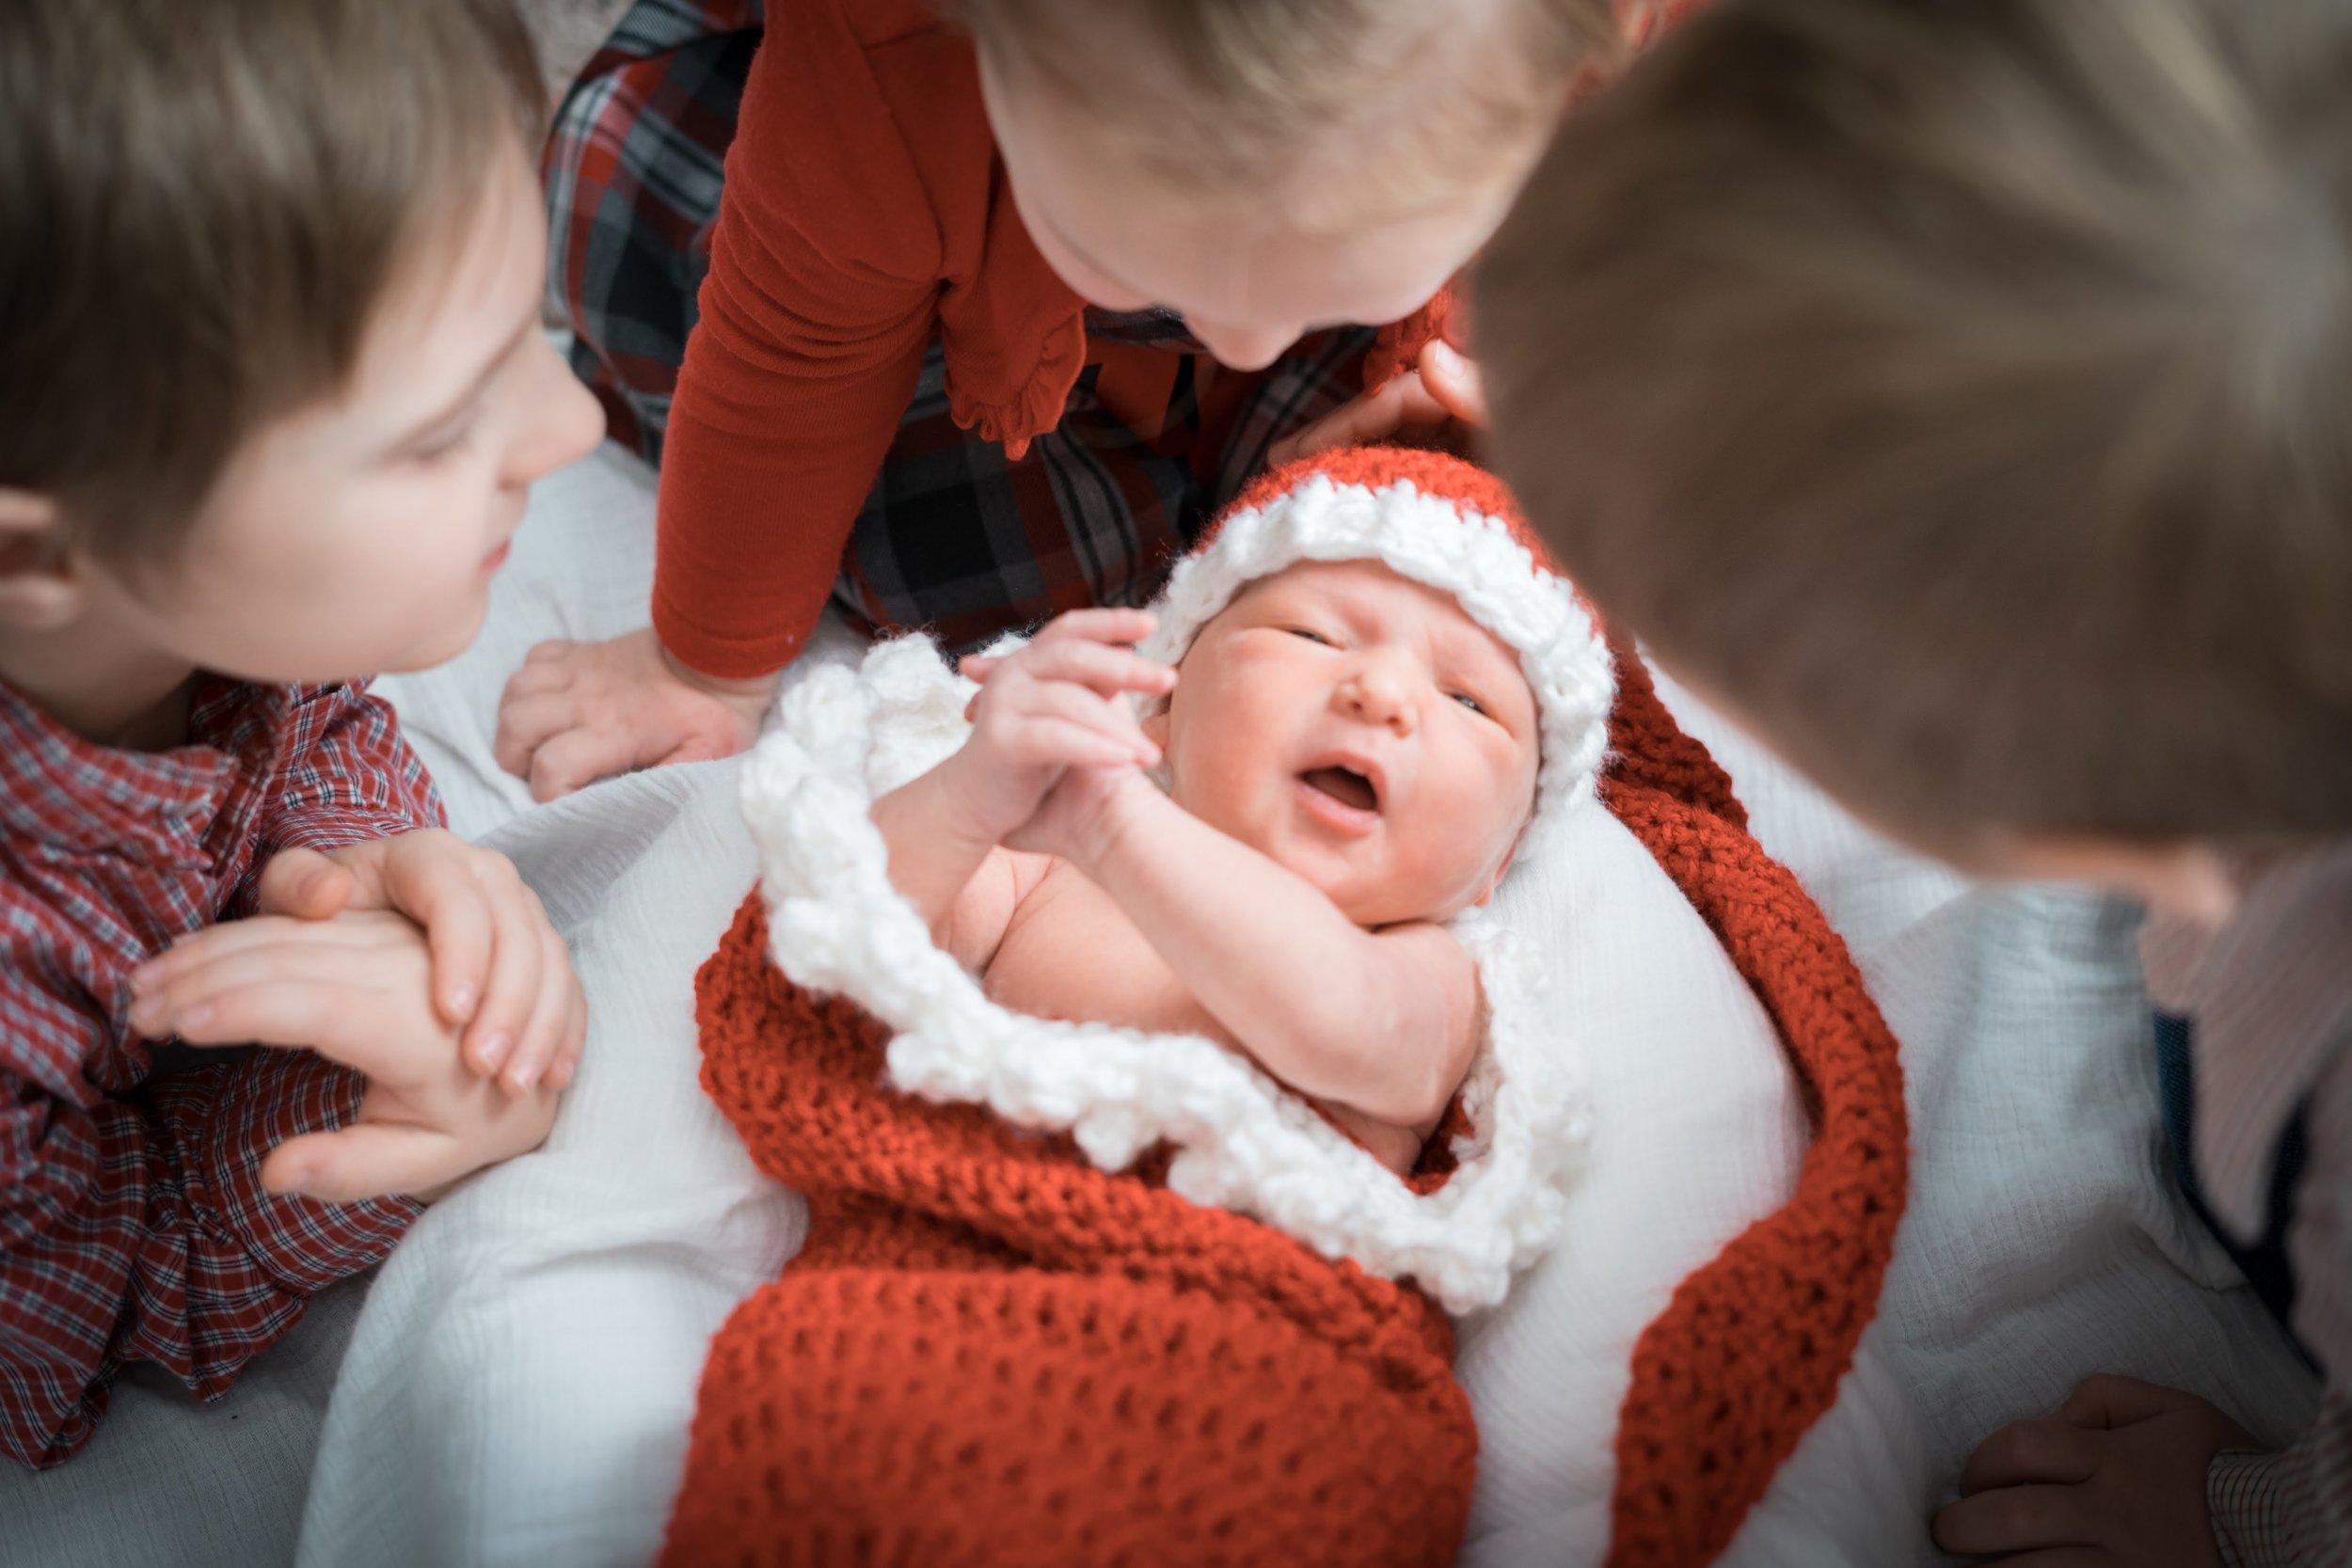 Kids around newborn